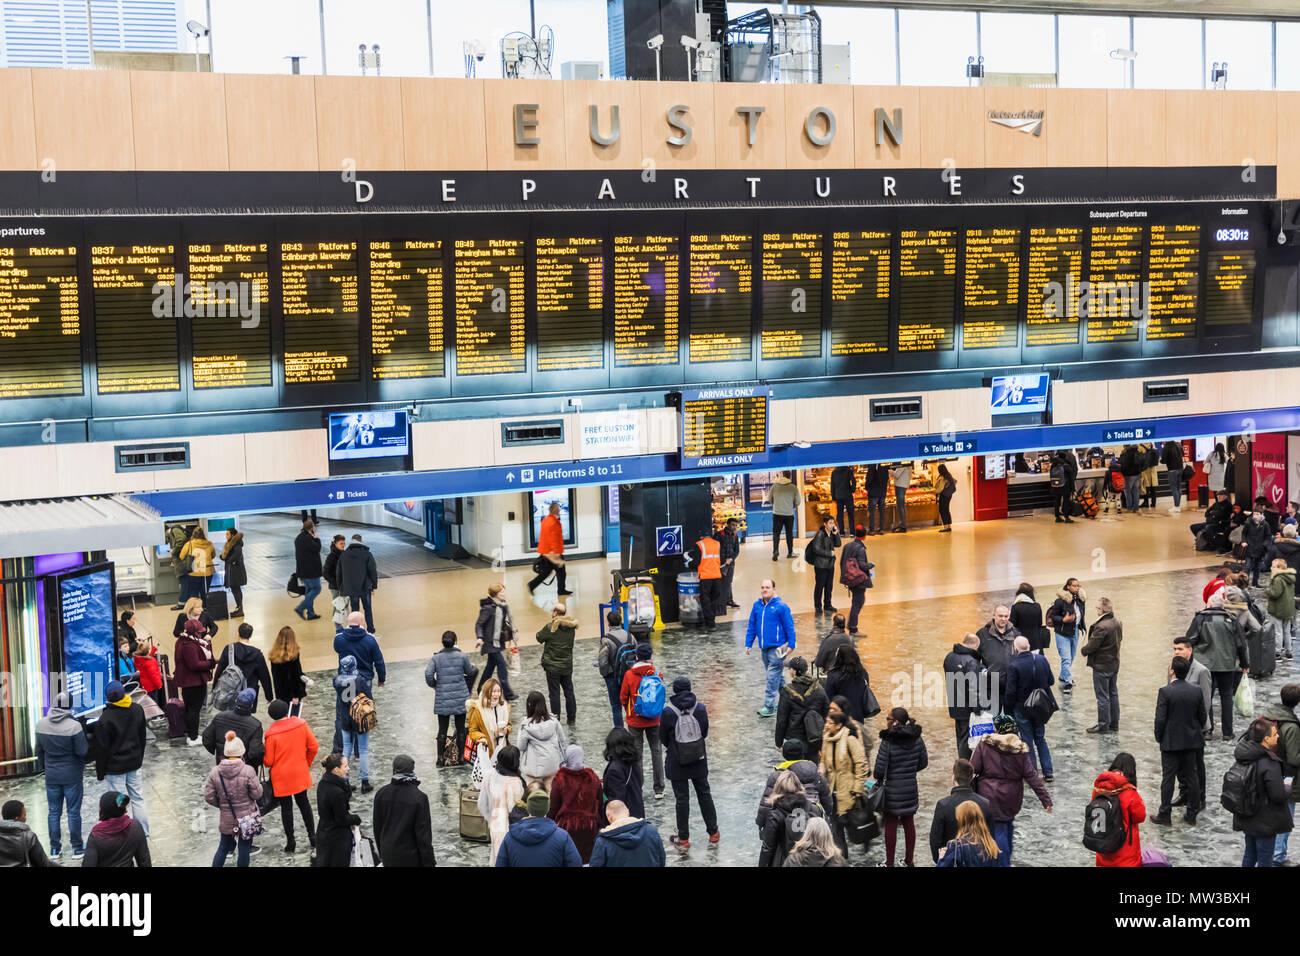 England London Euston Train Station Departure Concourse